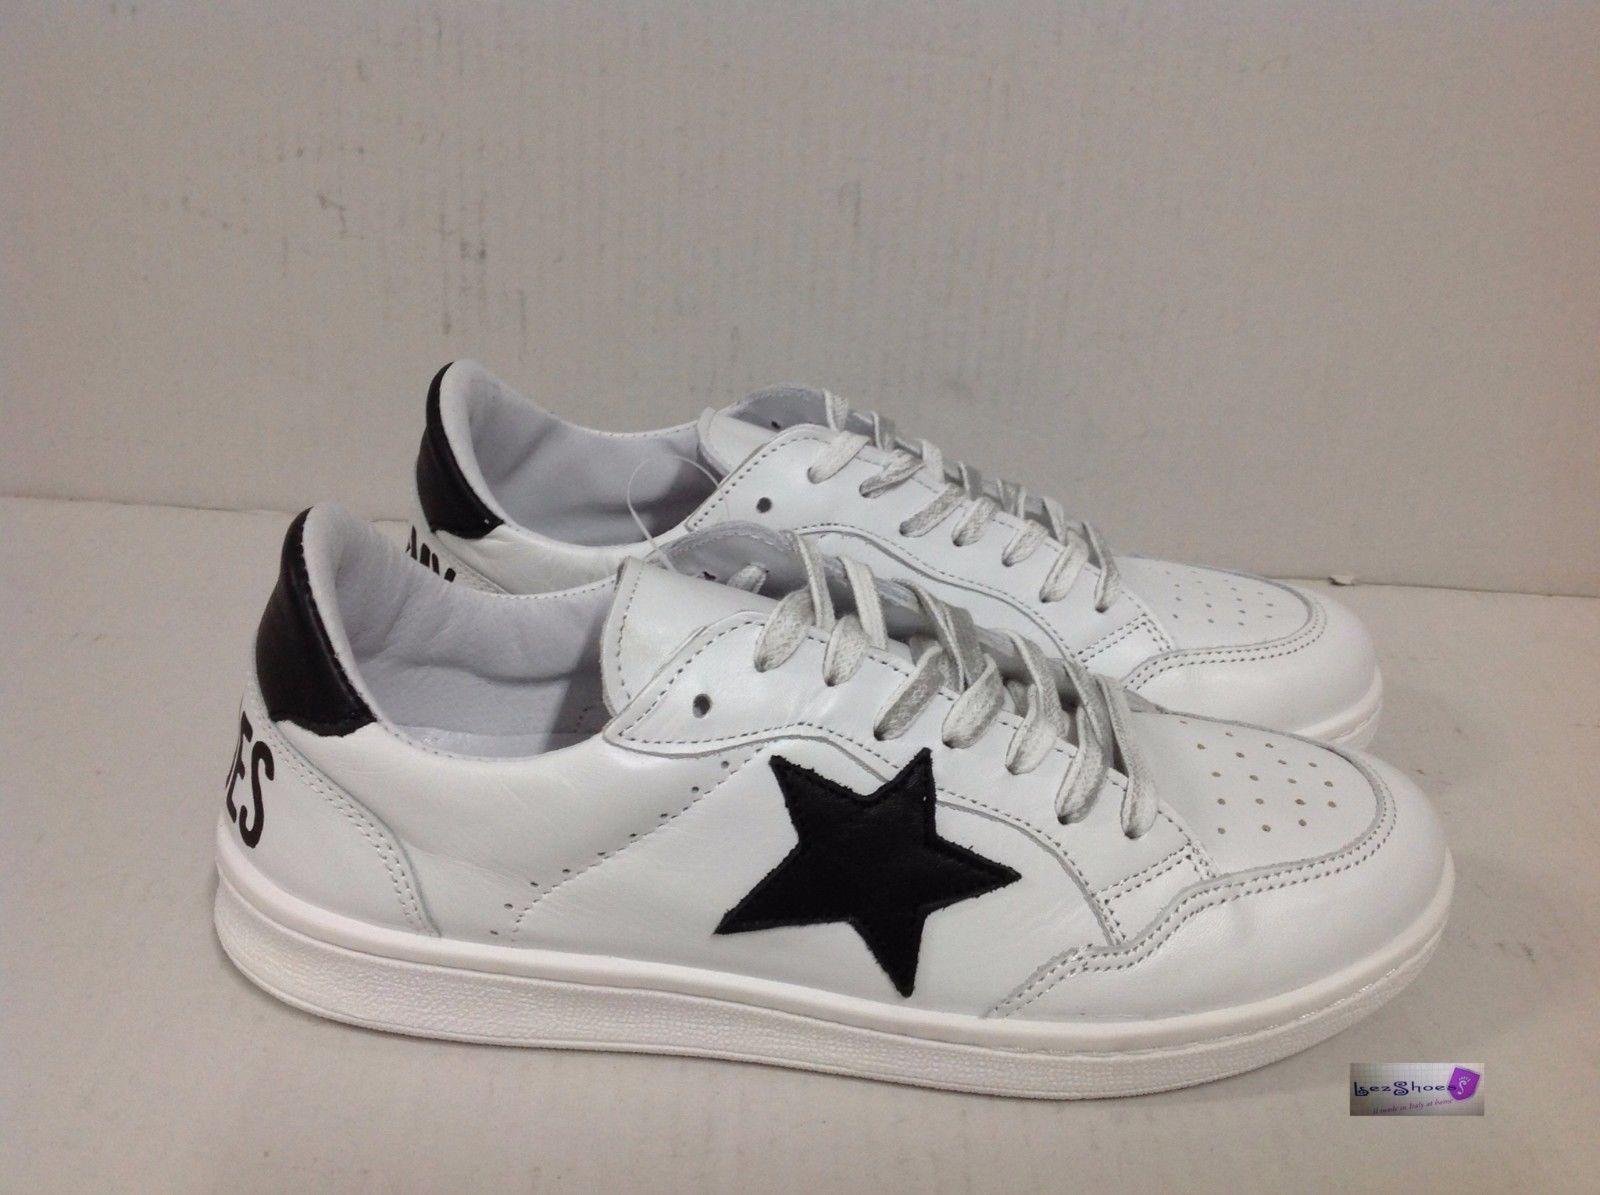 Uomo Basse Nera Sneakers Scarpe Old Ebay Stella Bianca Gold Pelle 9WE2DIH